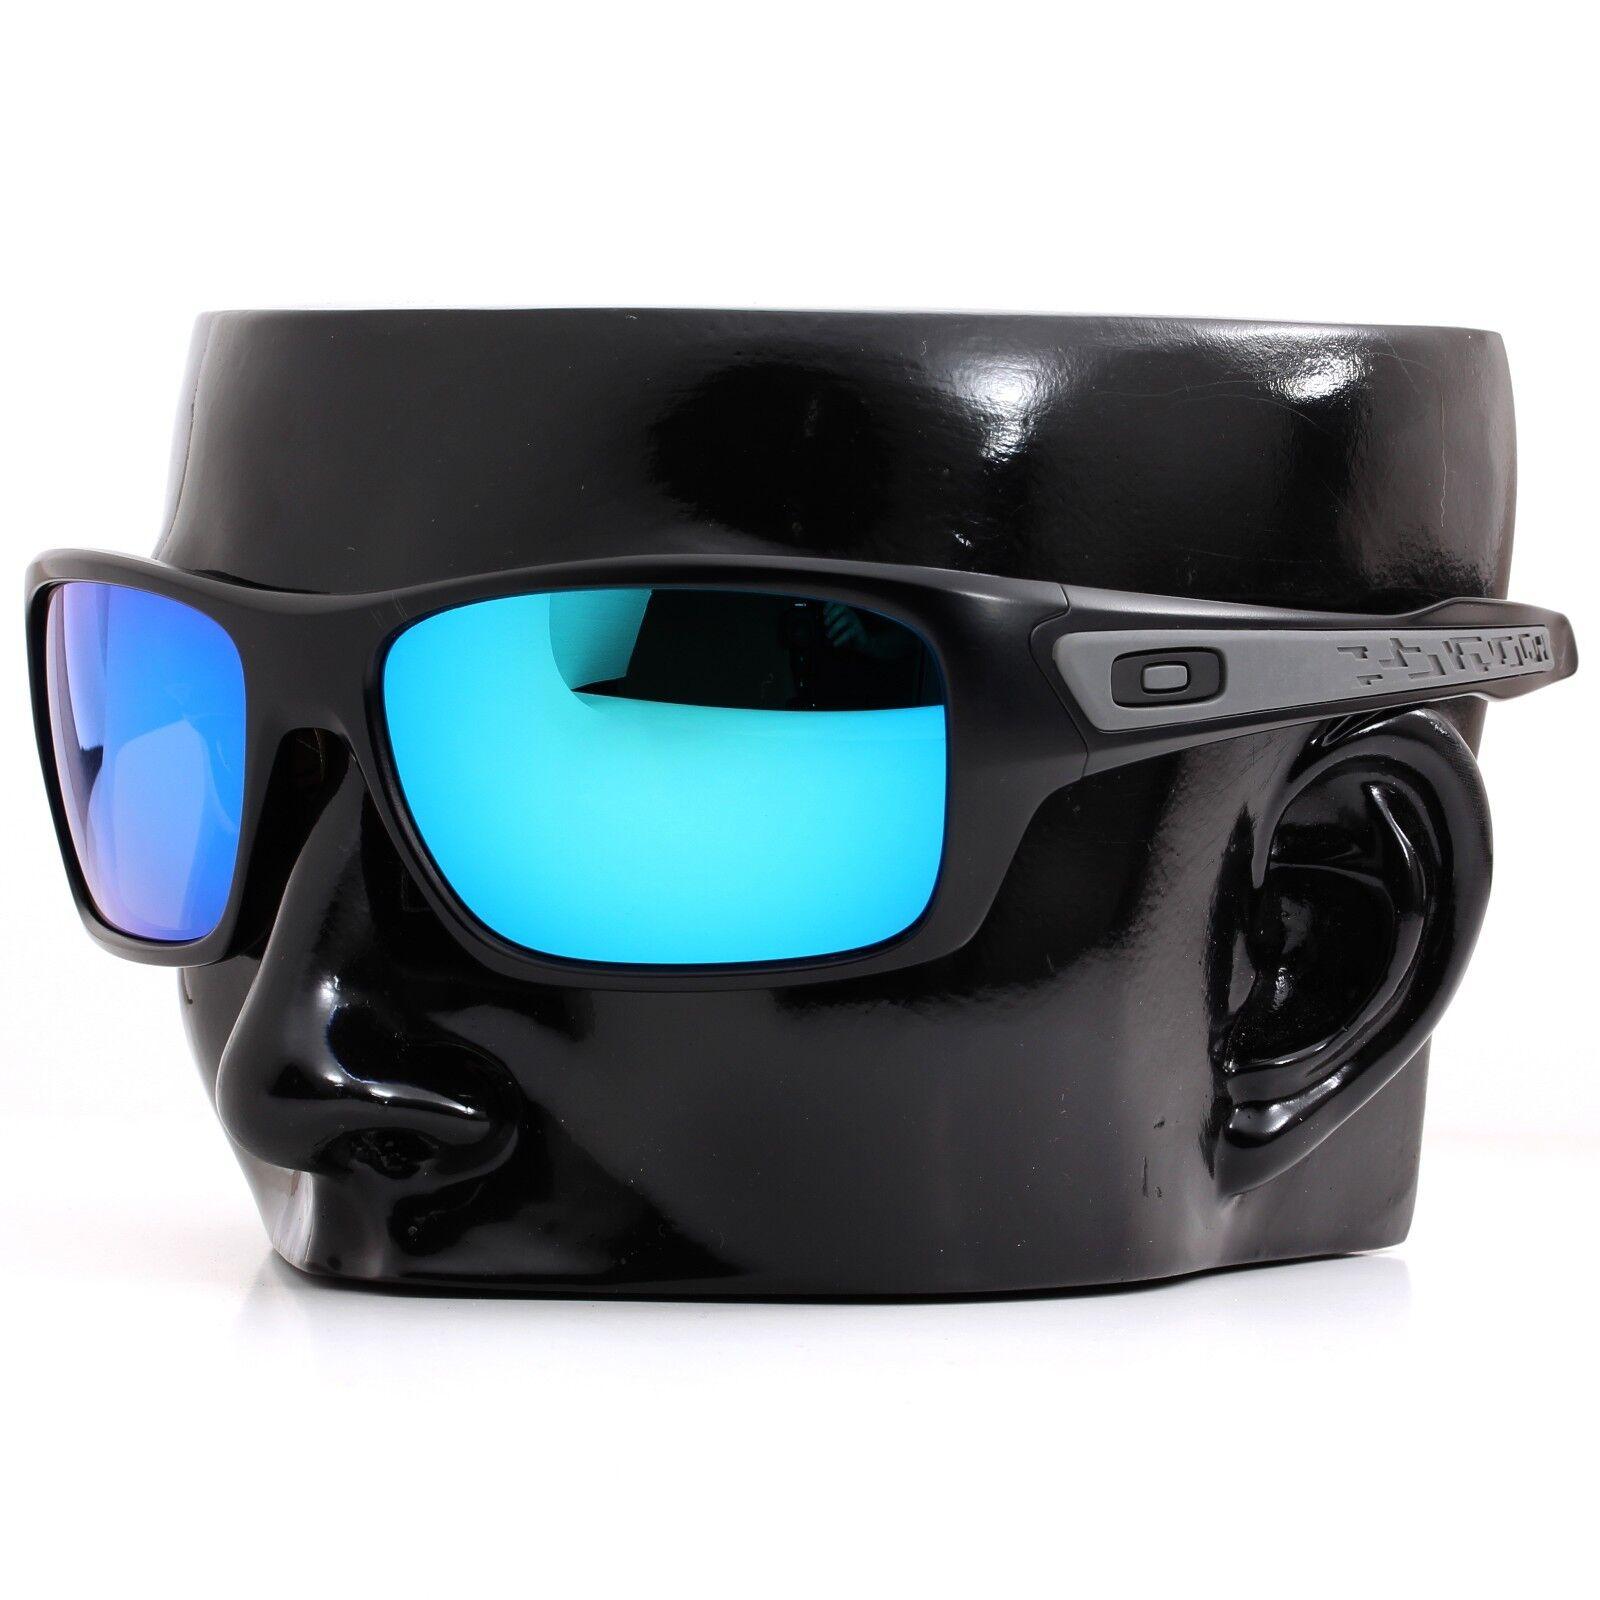 ab8c8a50a0 Polarized IKON Iridium Replacement Lenses For Oakley Turbine Ice Blue  Mirror